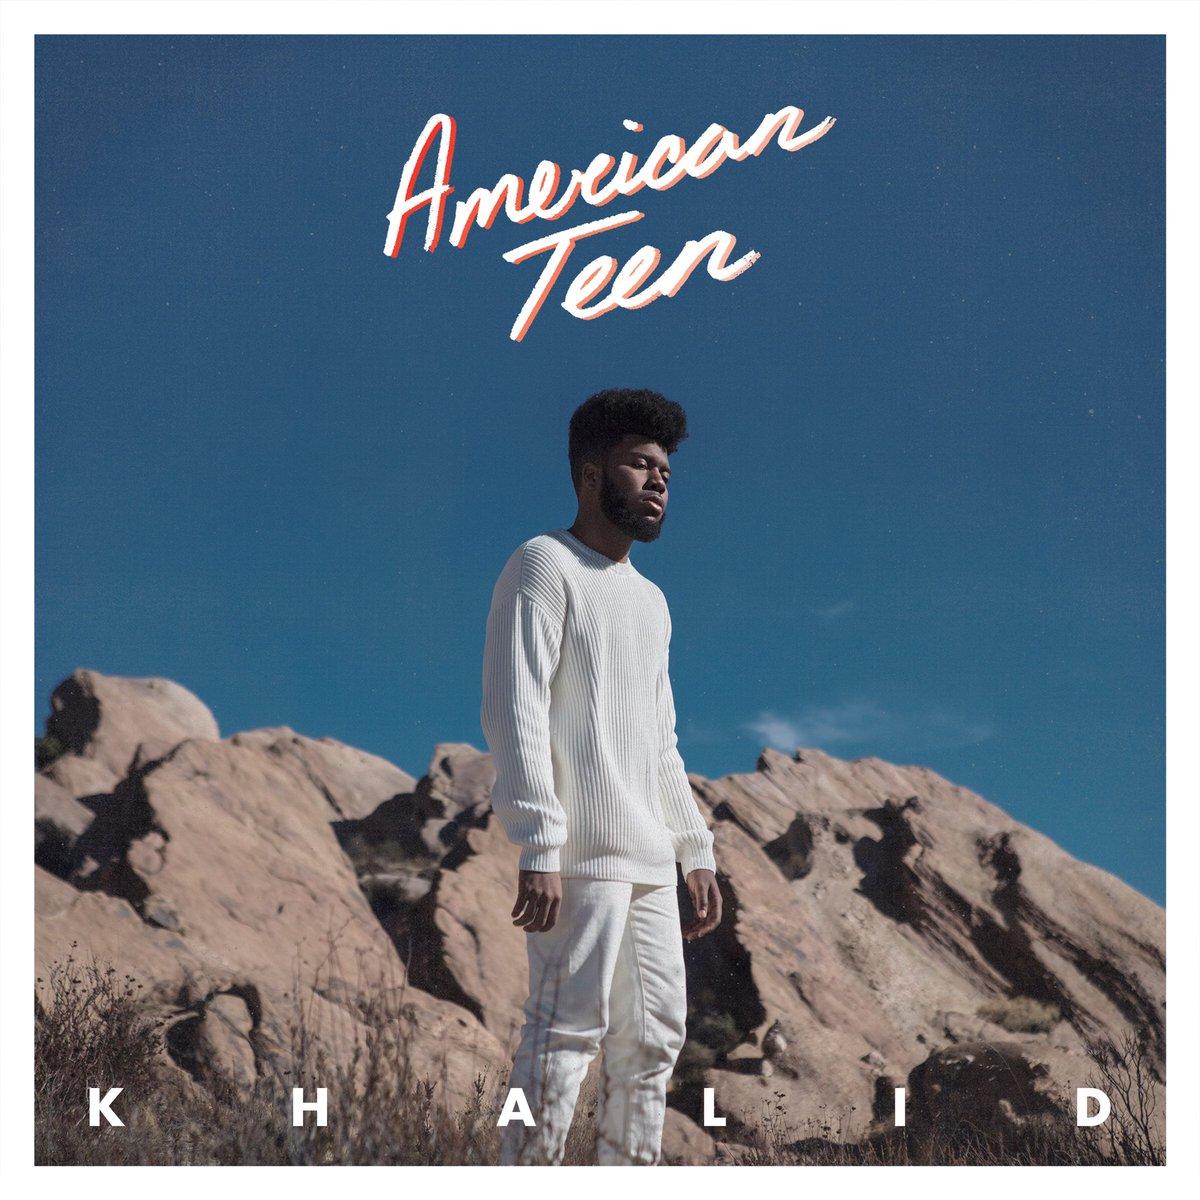 khalid american teen album